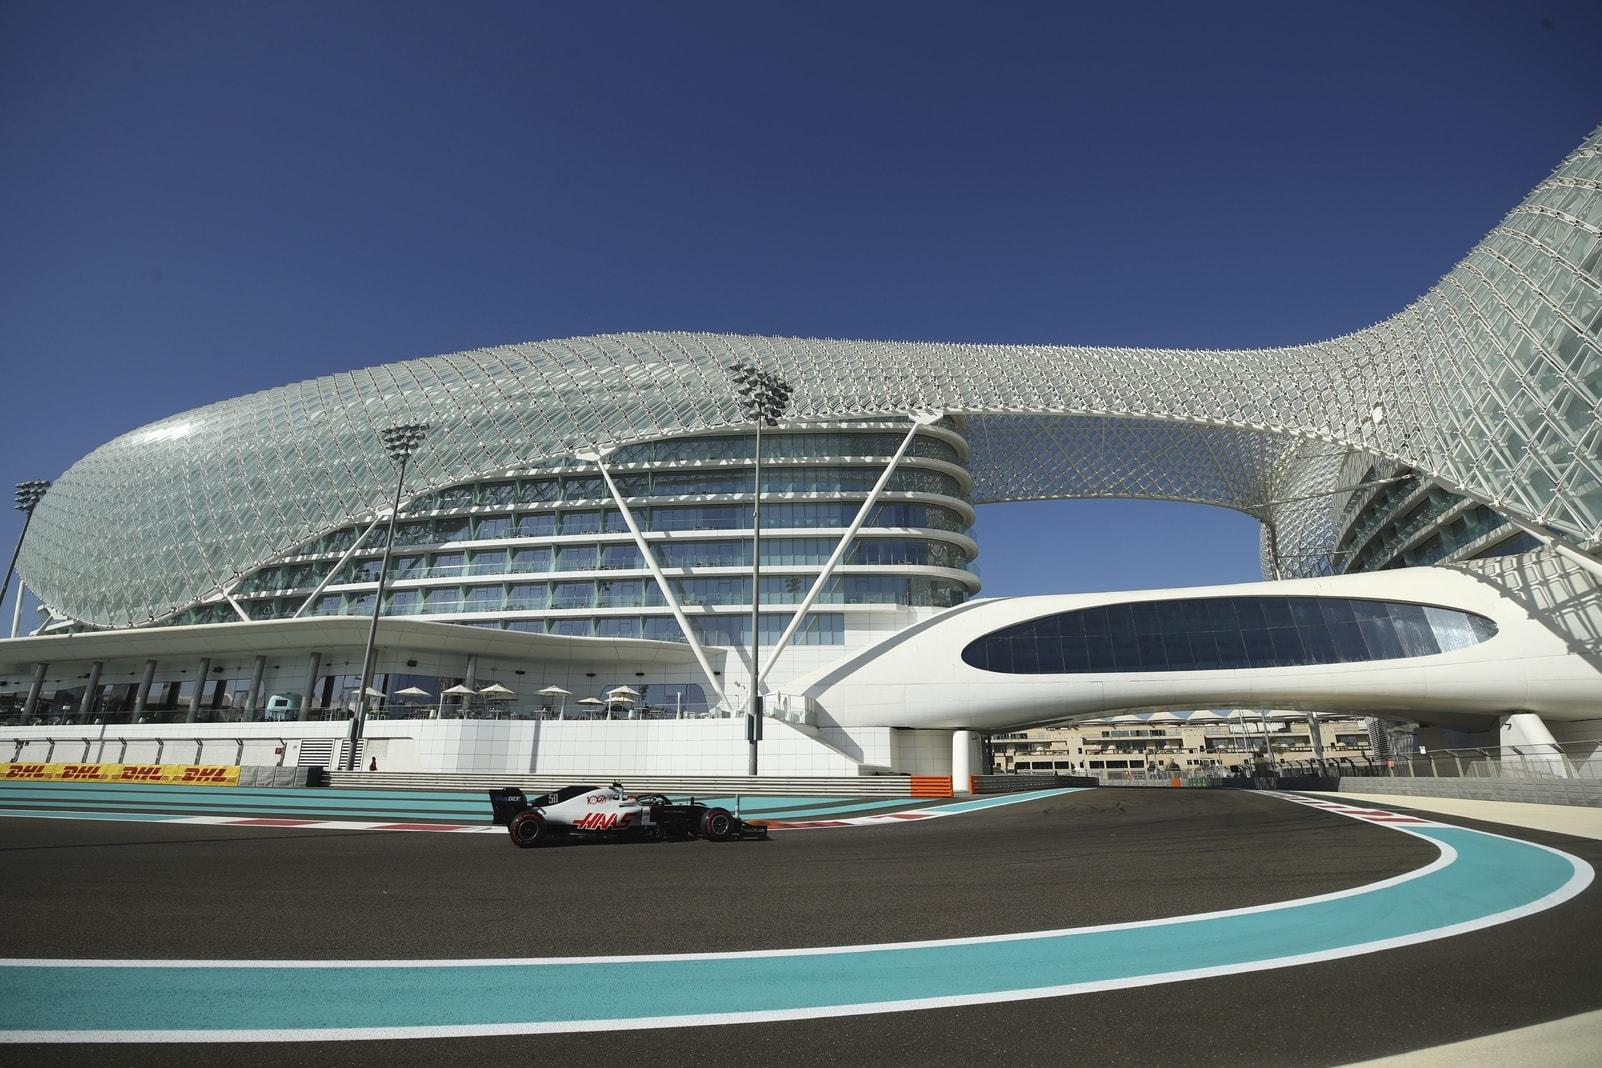 Mick Schumacher Formel 1-Debüt Haas Abu Dhabi 2